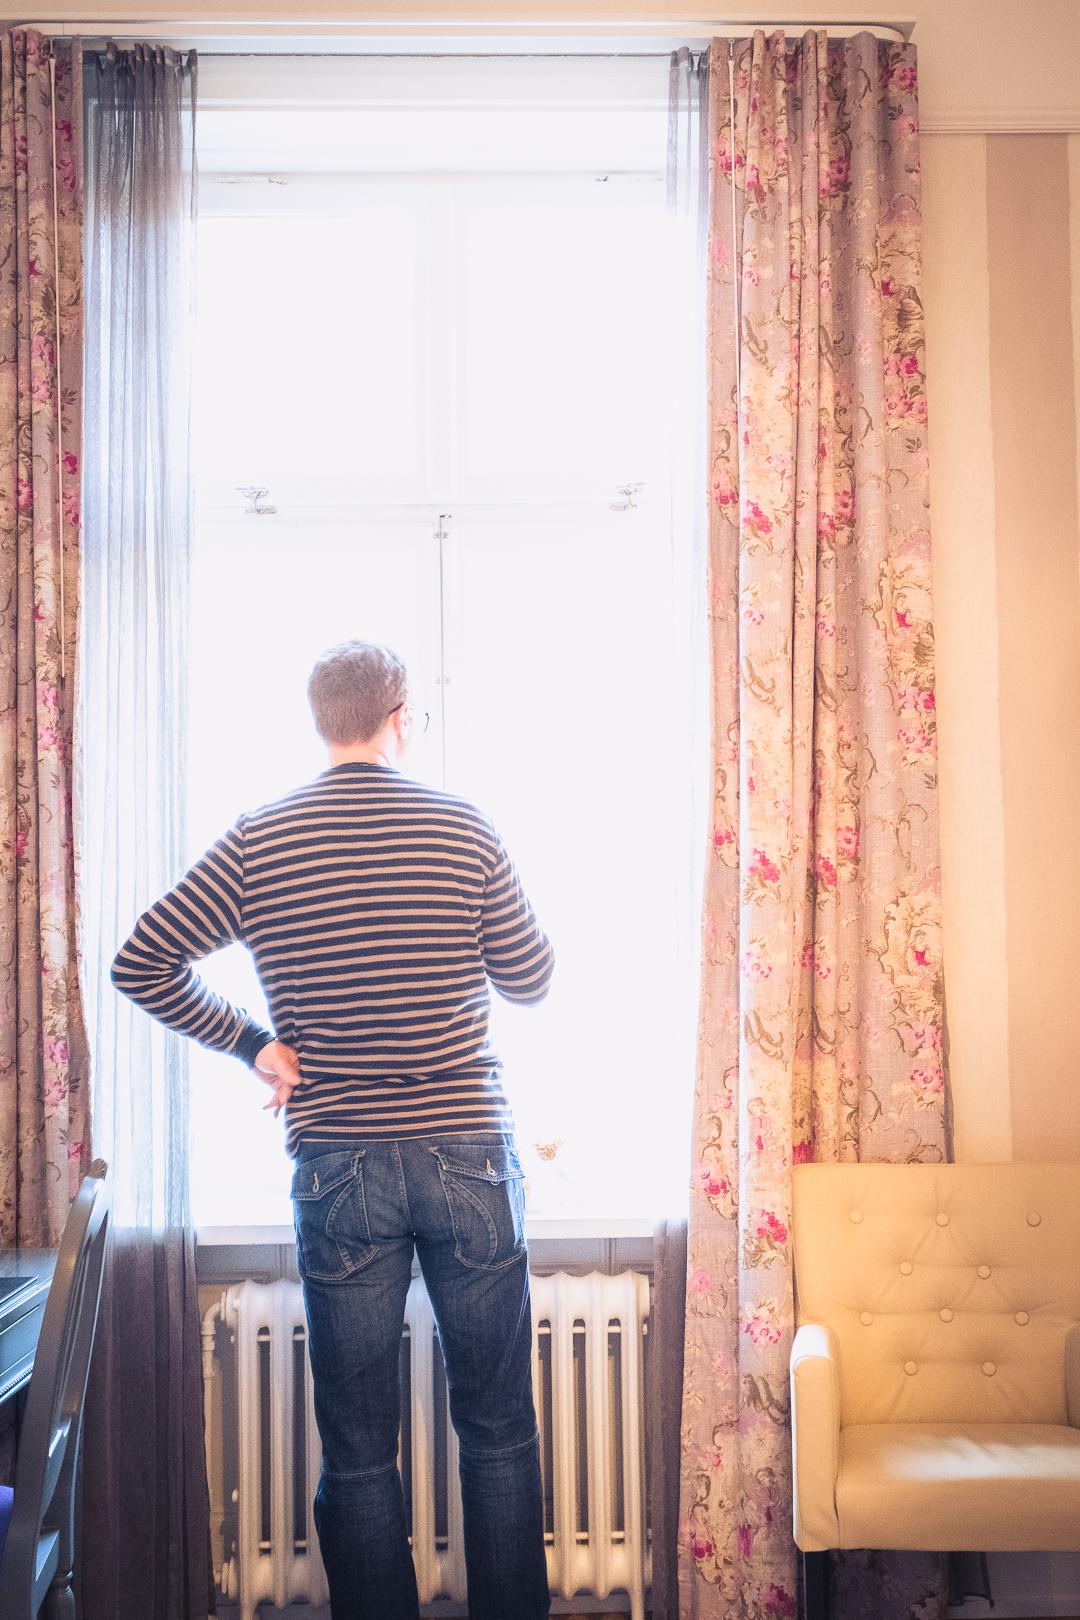 bo på hotell kung carl på stureplan i stockholm